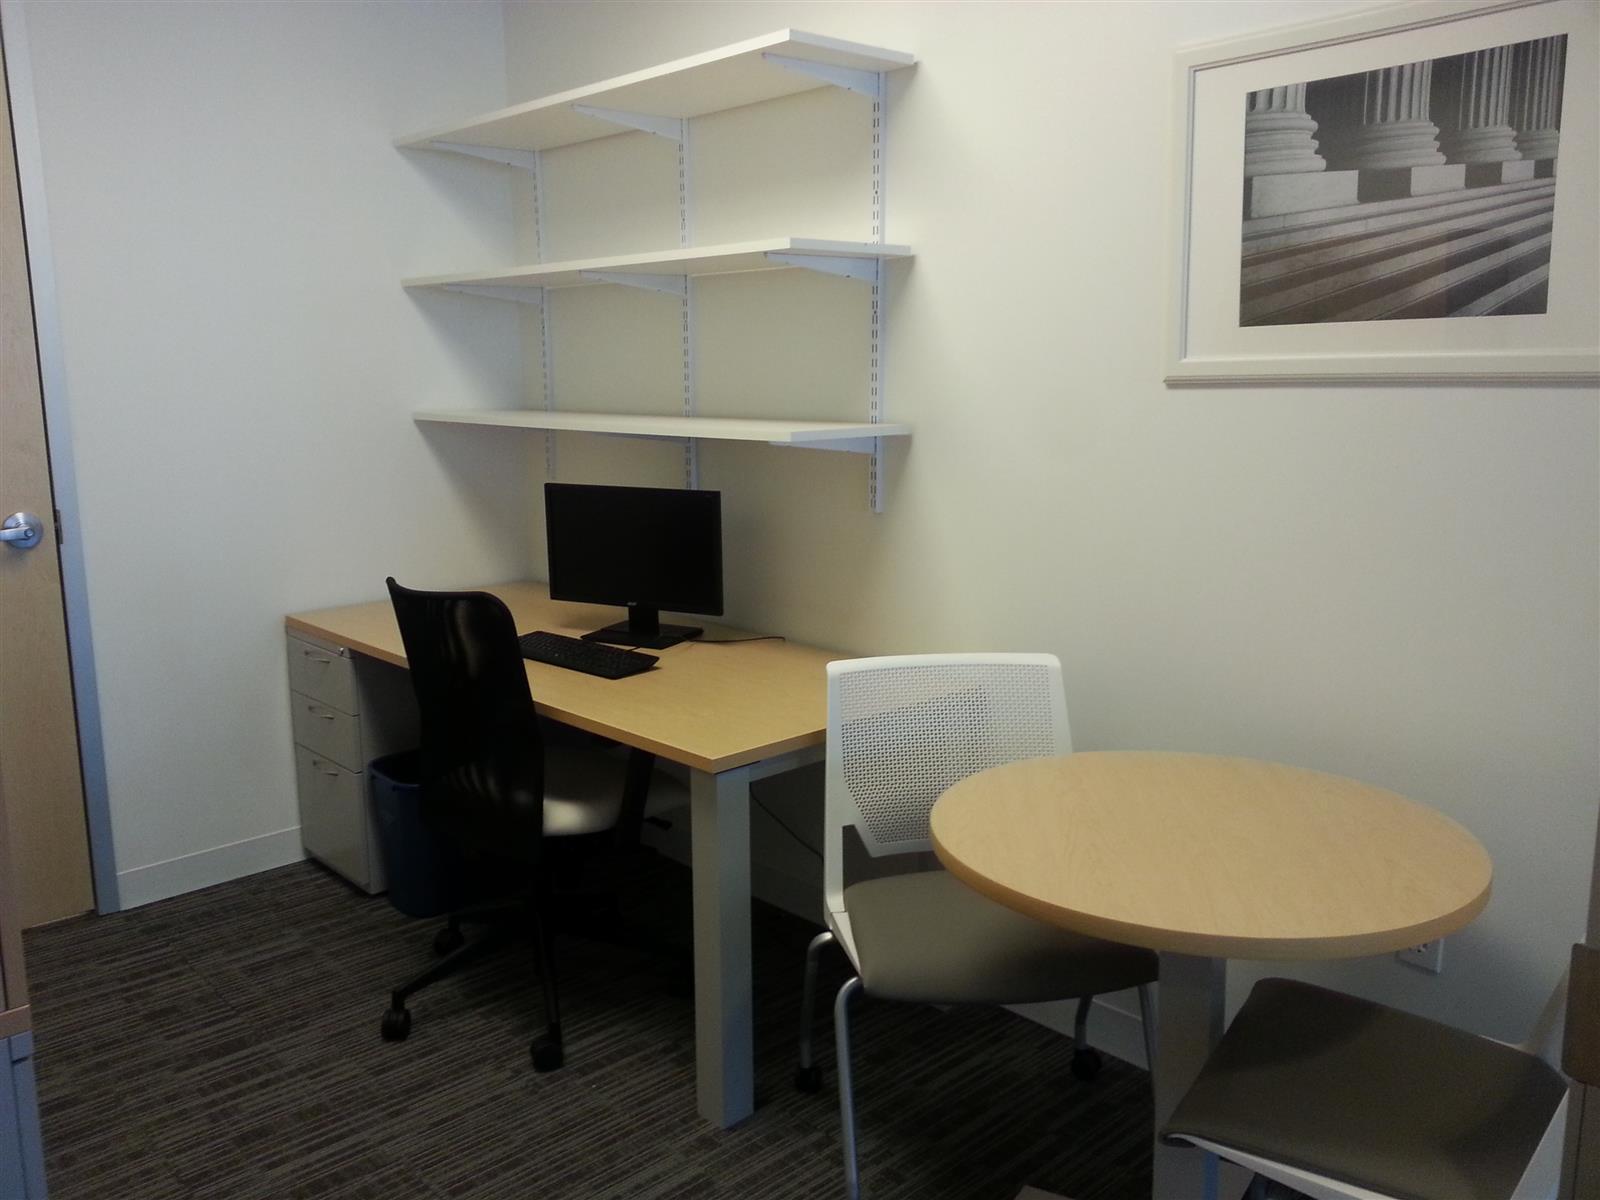 EC English Learning Centre - Washington, DC - Individual Office (1 person)